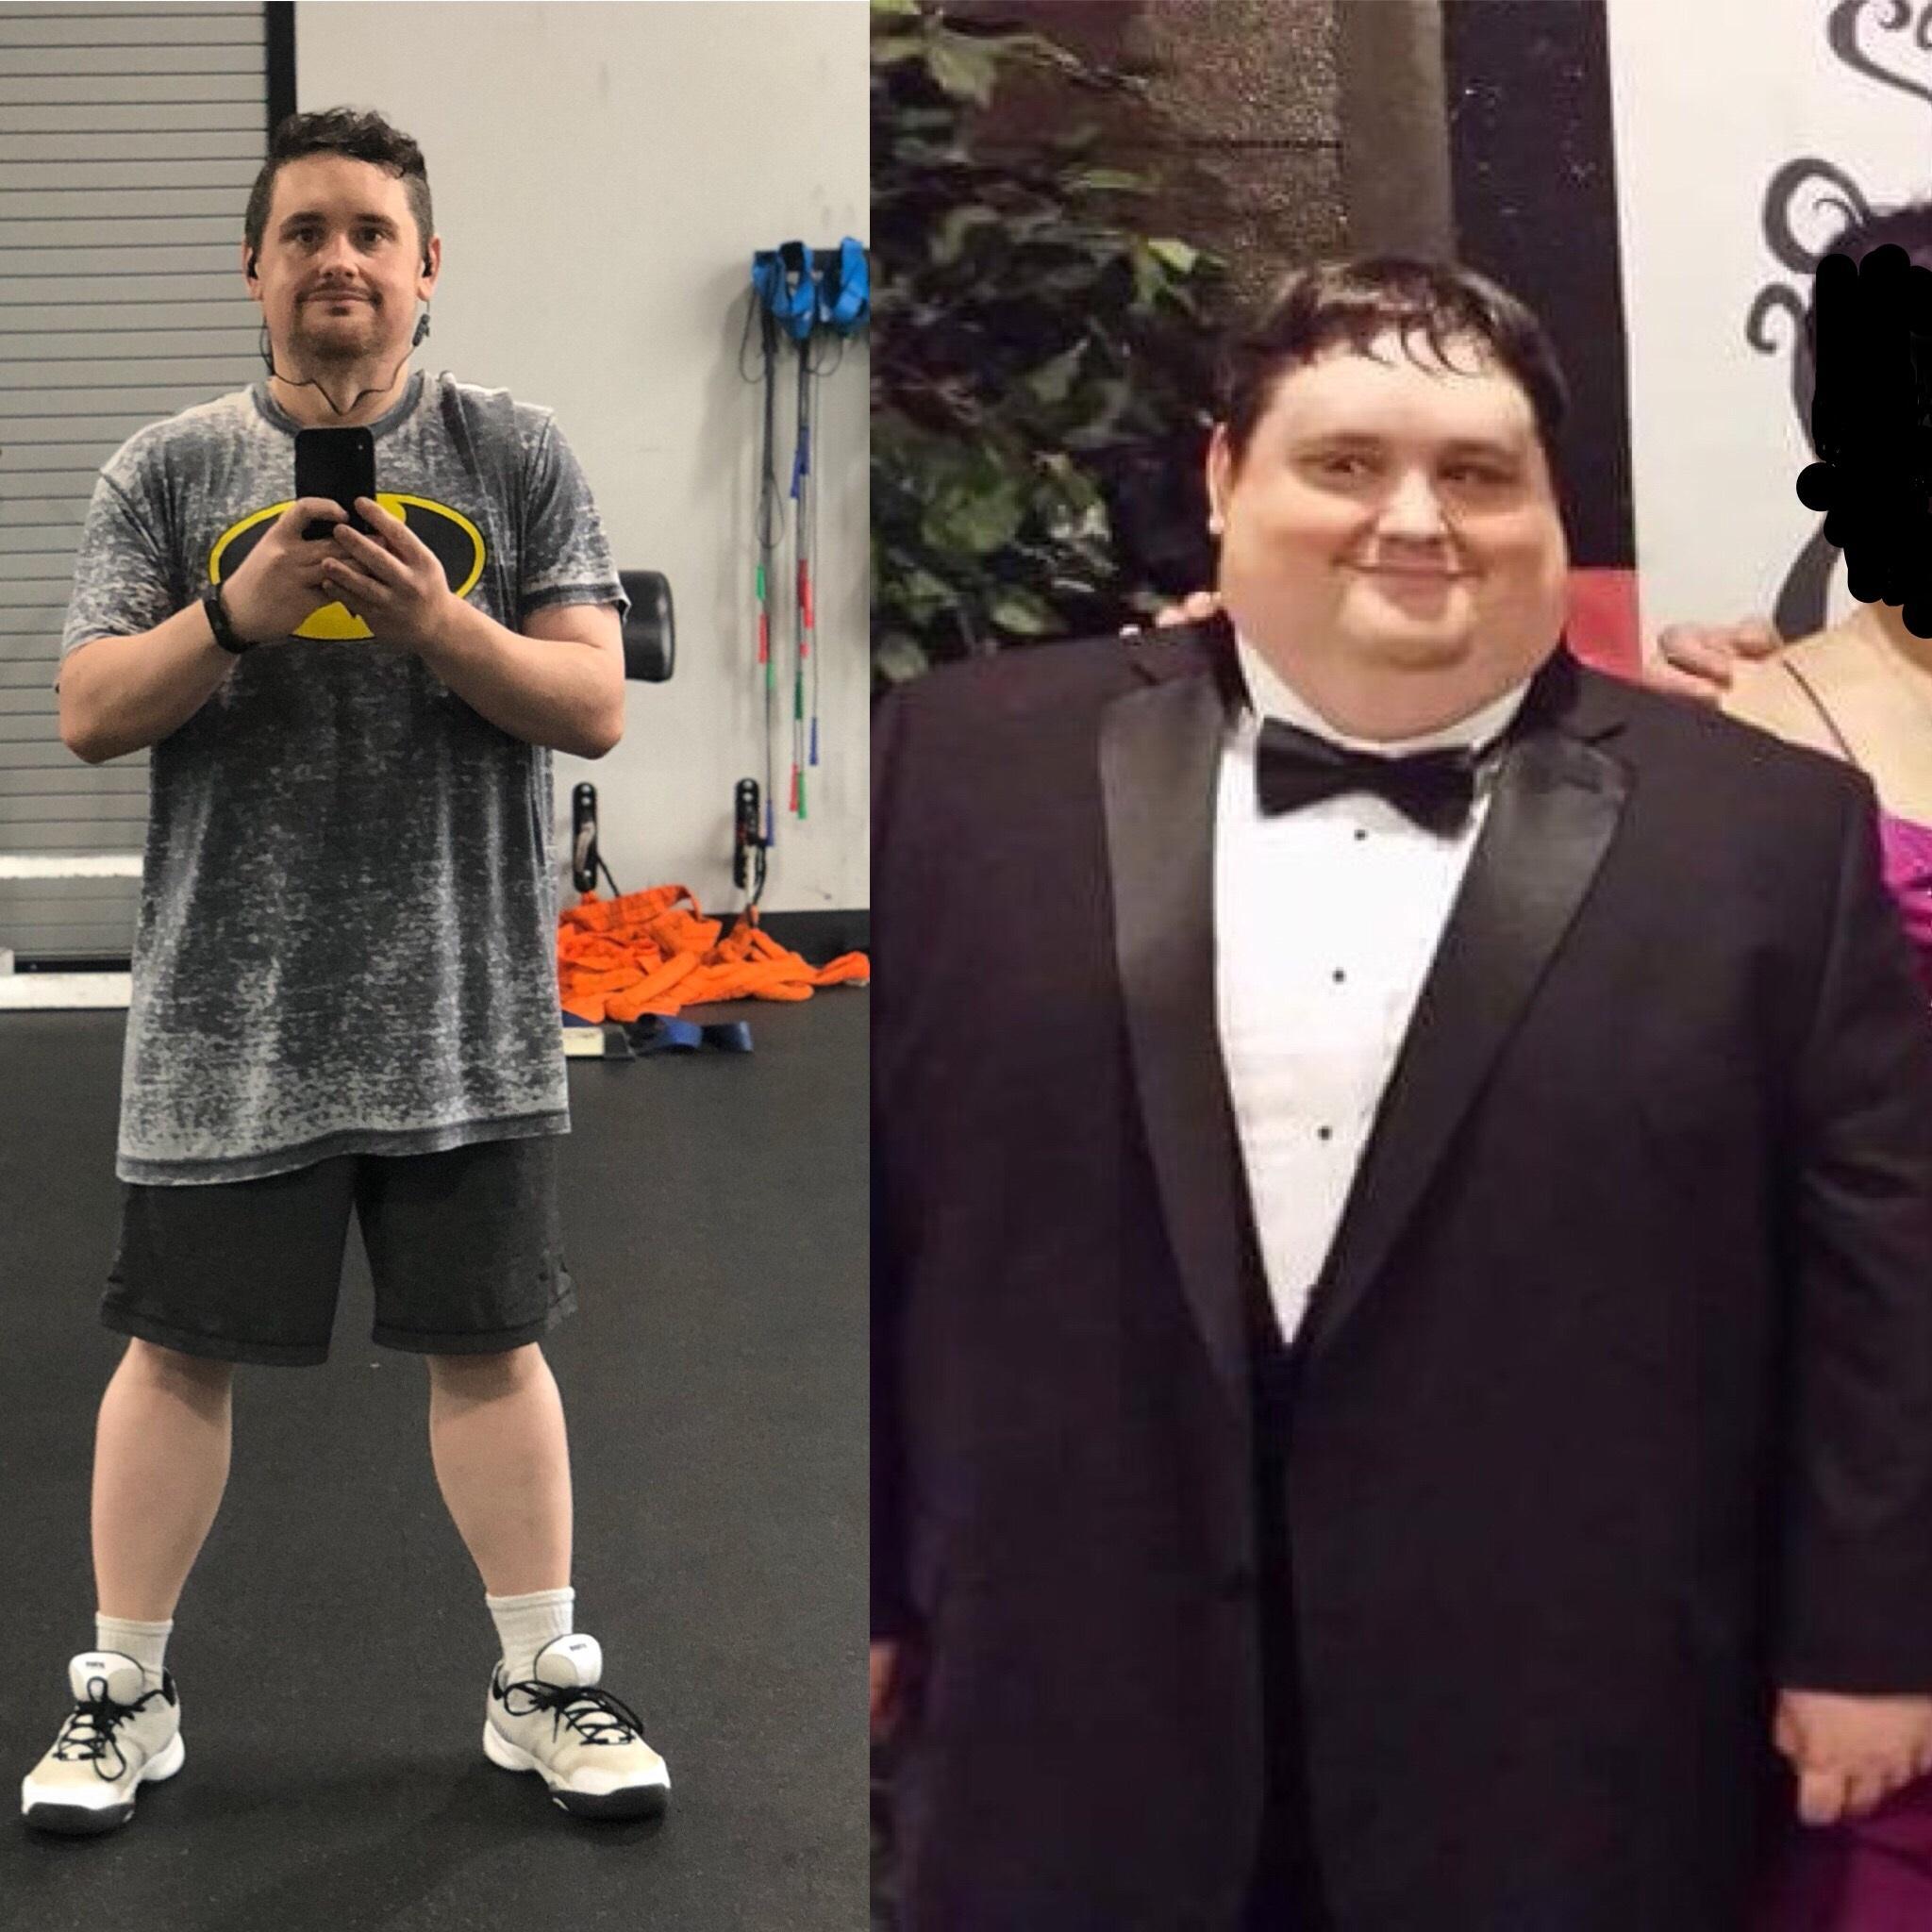 5 foot 6 Male Progress Pics of 141 lbs Weight Loss 334 lbs to 193 lbs